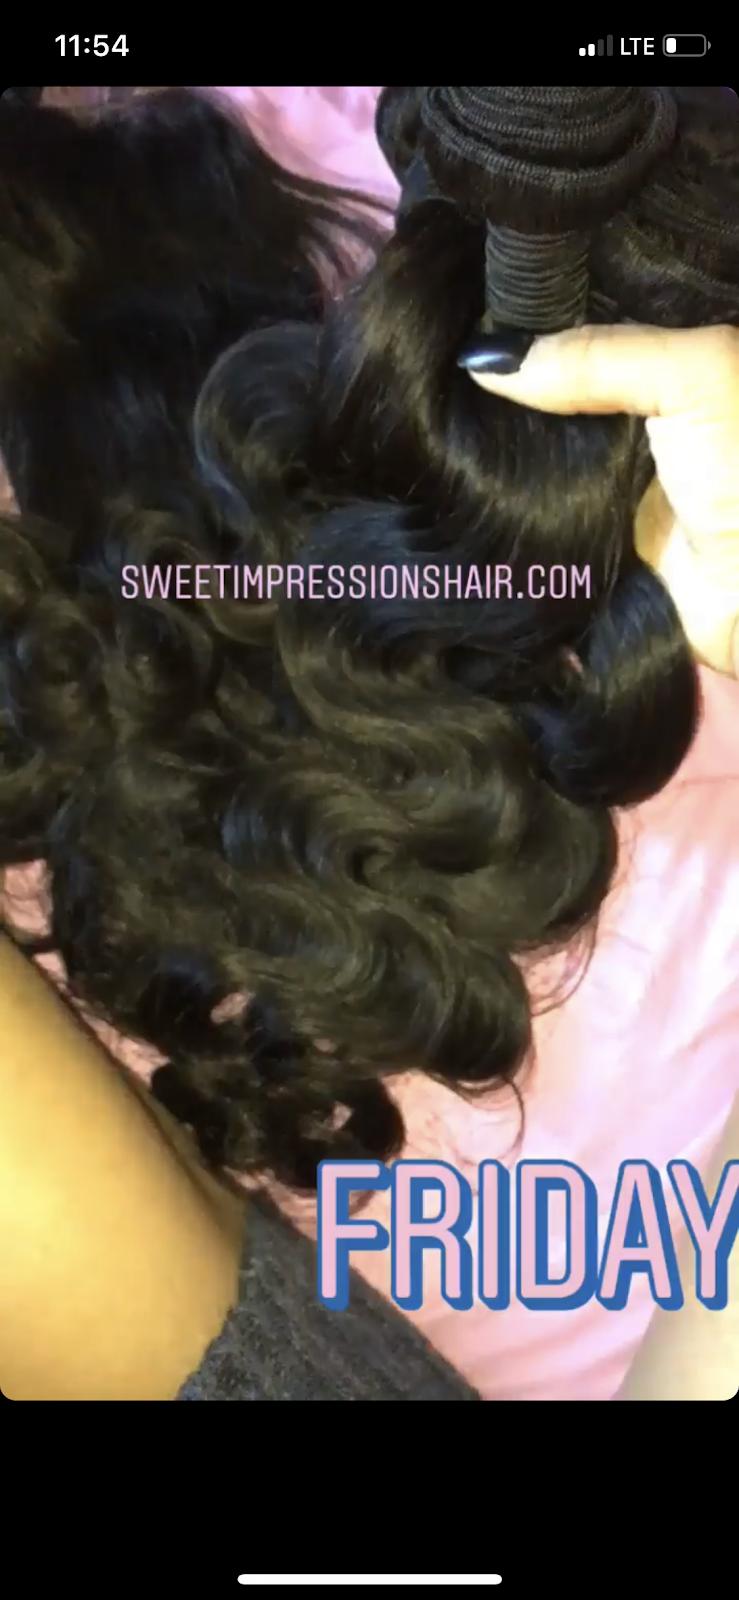 Sweet Impressions Hair - hair care  | Photo 9 of 10 | Address: Milwaukee, WI, USA | Phone: (475) 988-6549